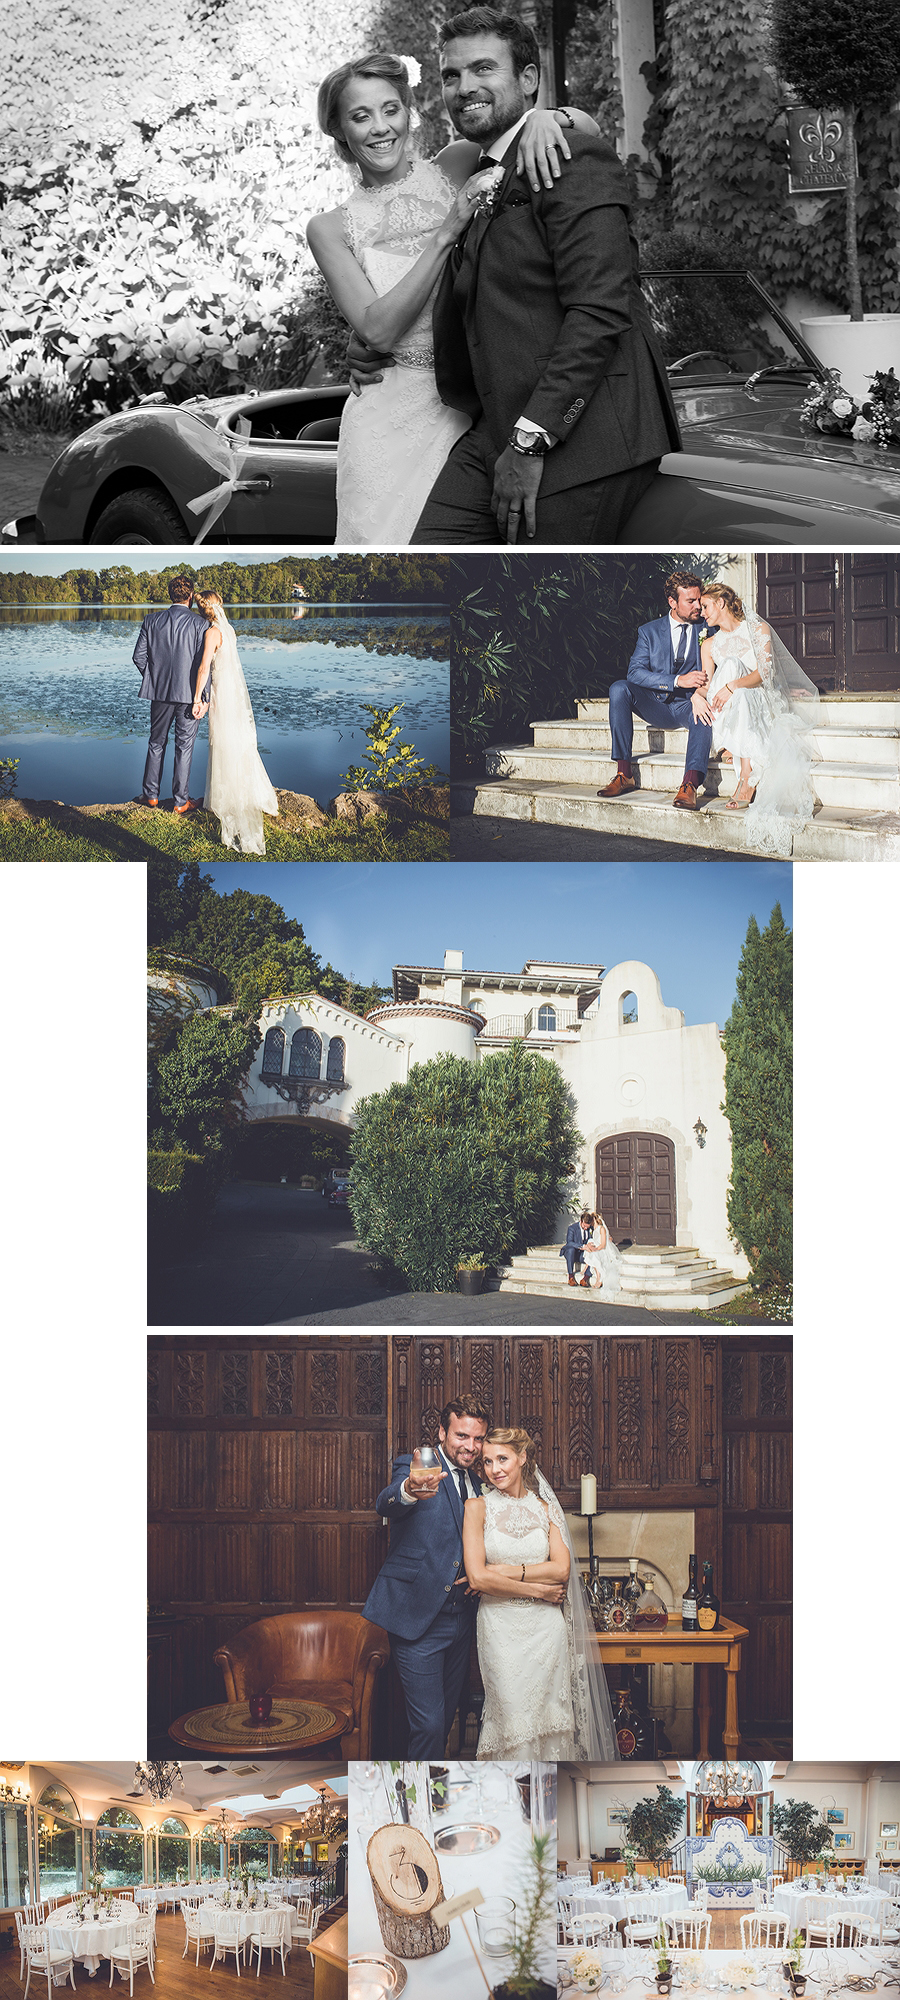 Isabelle-palé-photographe-mariage-anglet-biarritz-chateau-brindos-bayonne-pays-basque-wedding-photographer-gatsby_2017-07